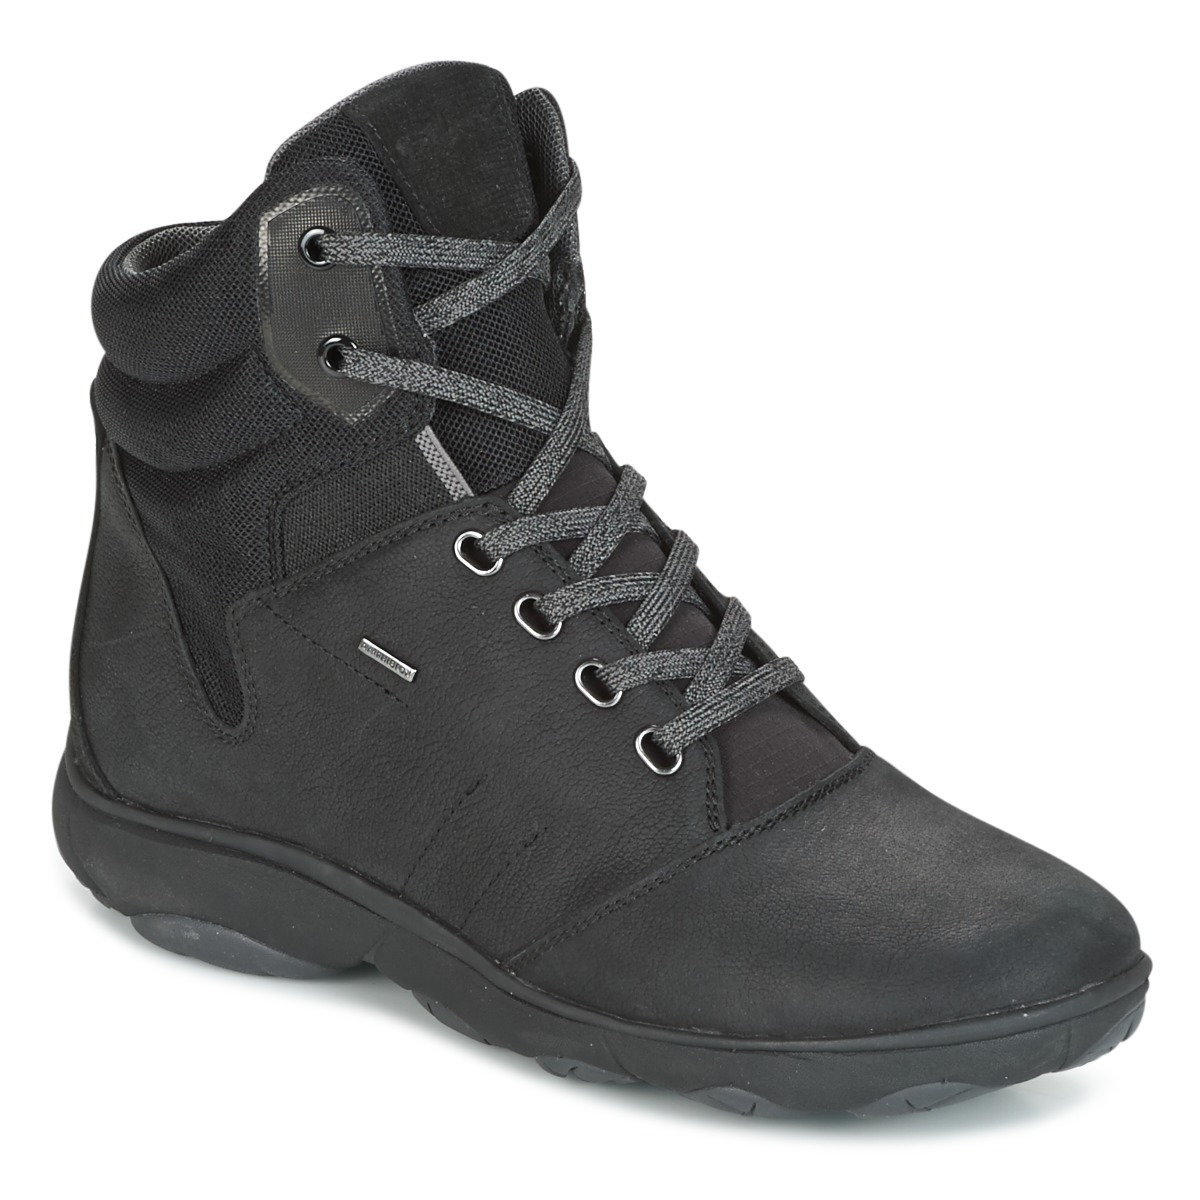 Geox D NEBULA 4 X 4 B ABX Schwarz - Kostenloser Versand bei Spartoode ! - Schuhe Sneaker High Damen 119,20 €